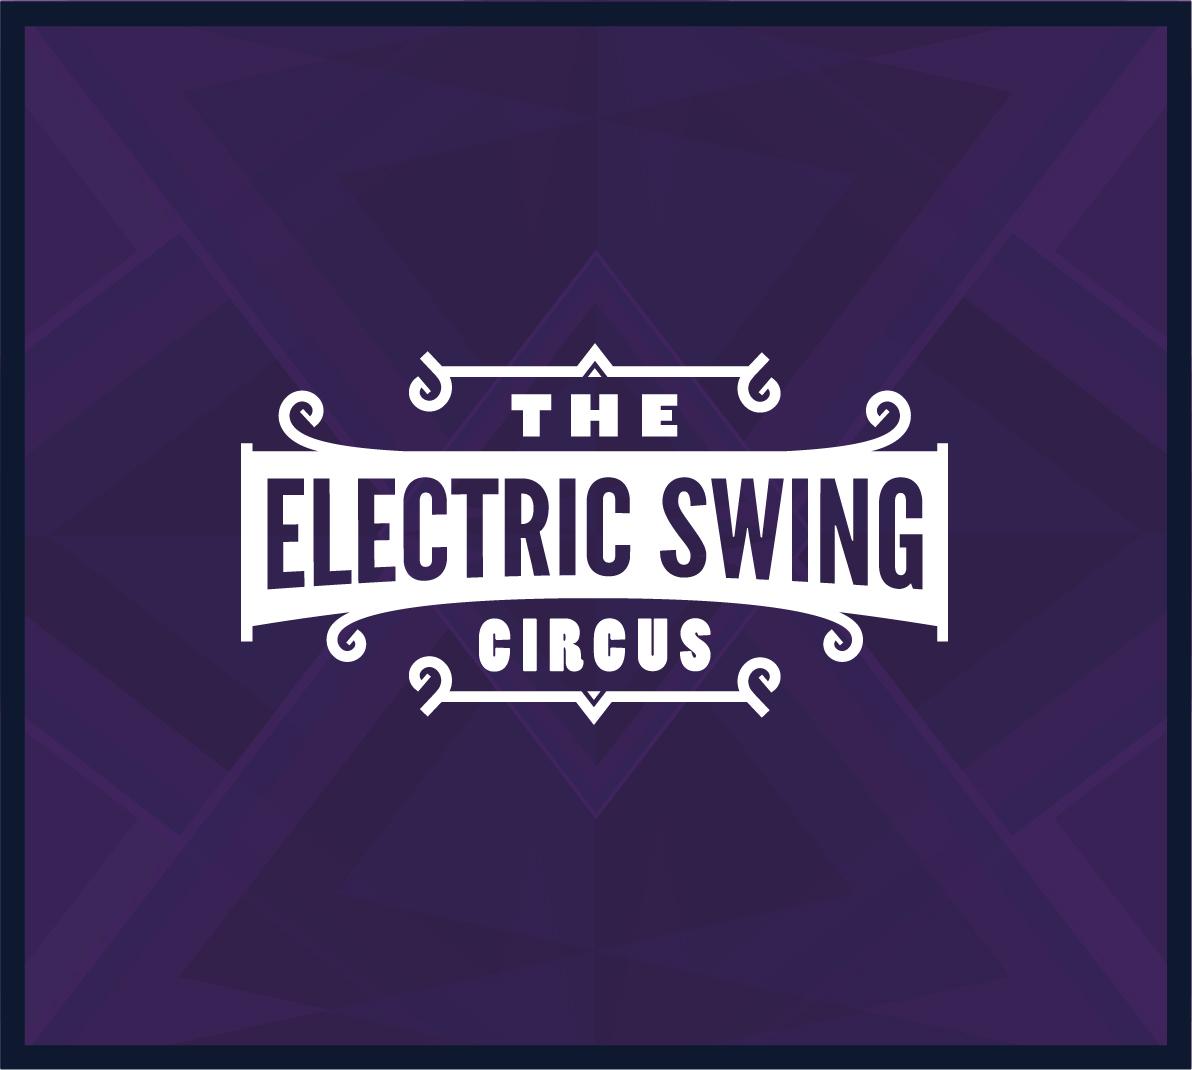 The Electric Swing Circus - Digital Dowload - Electric Swing Circus